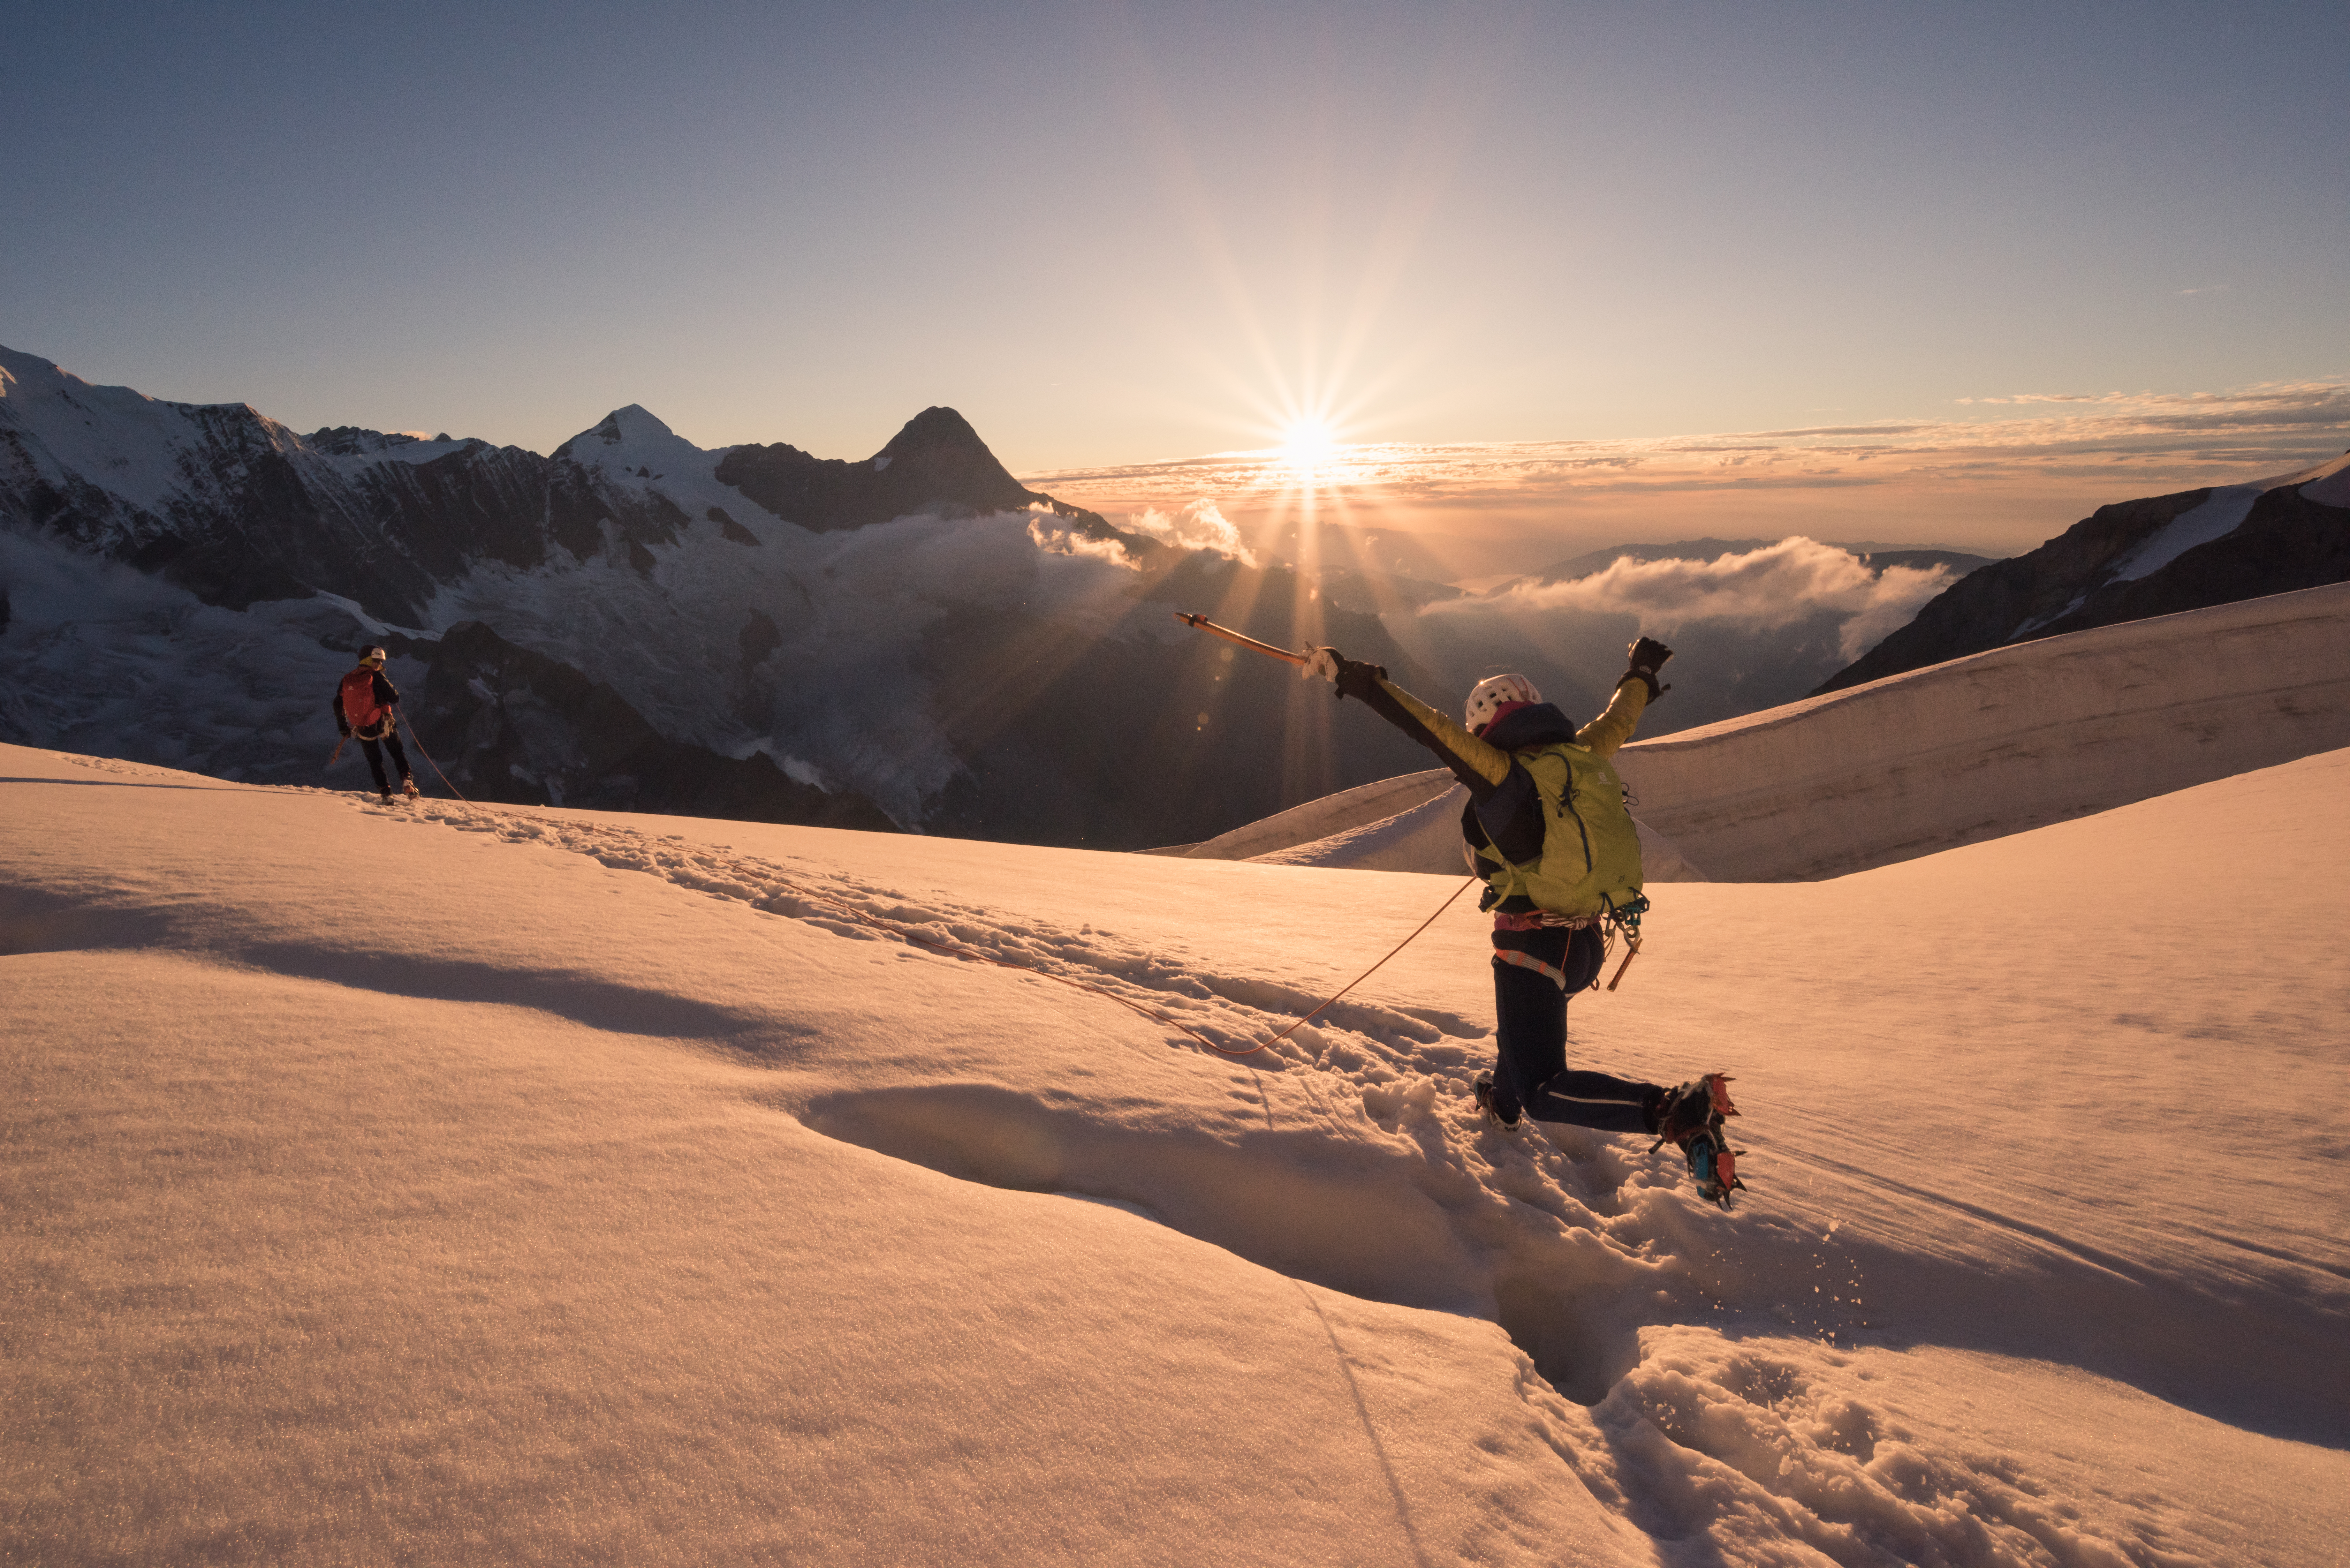 Liv Sansoz Jungfrau Monch Switzerland